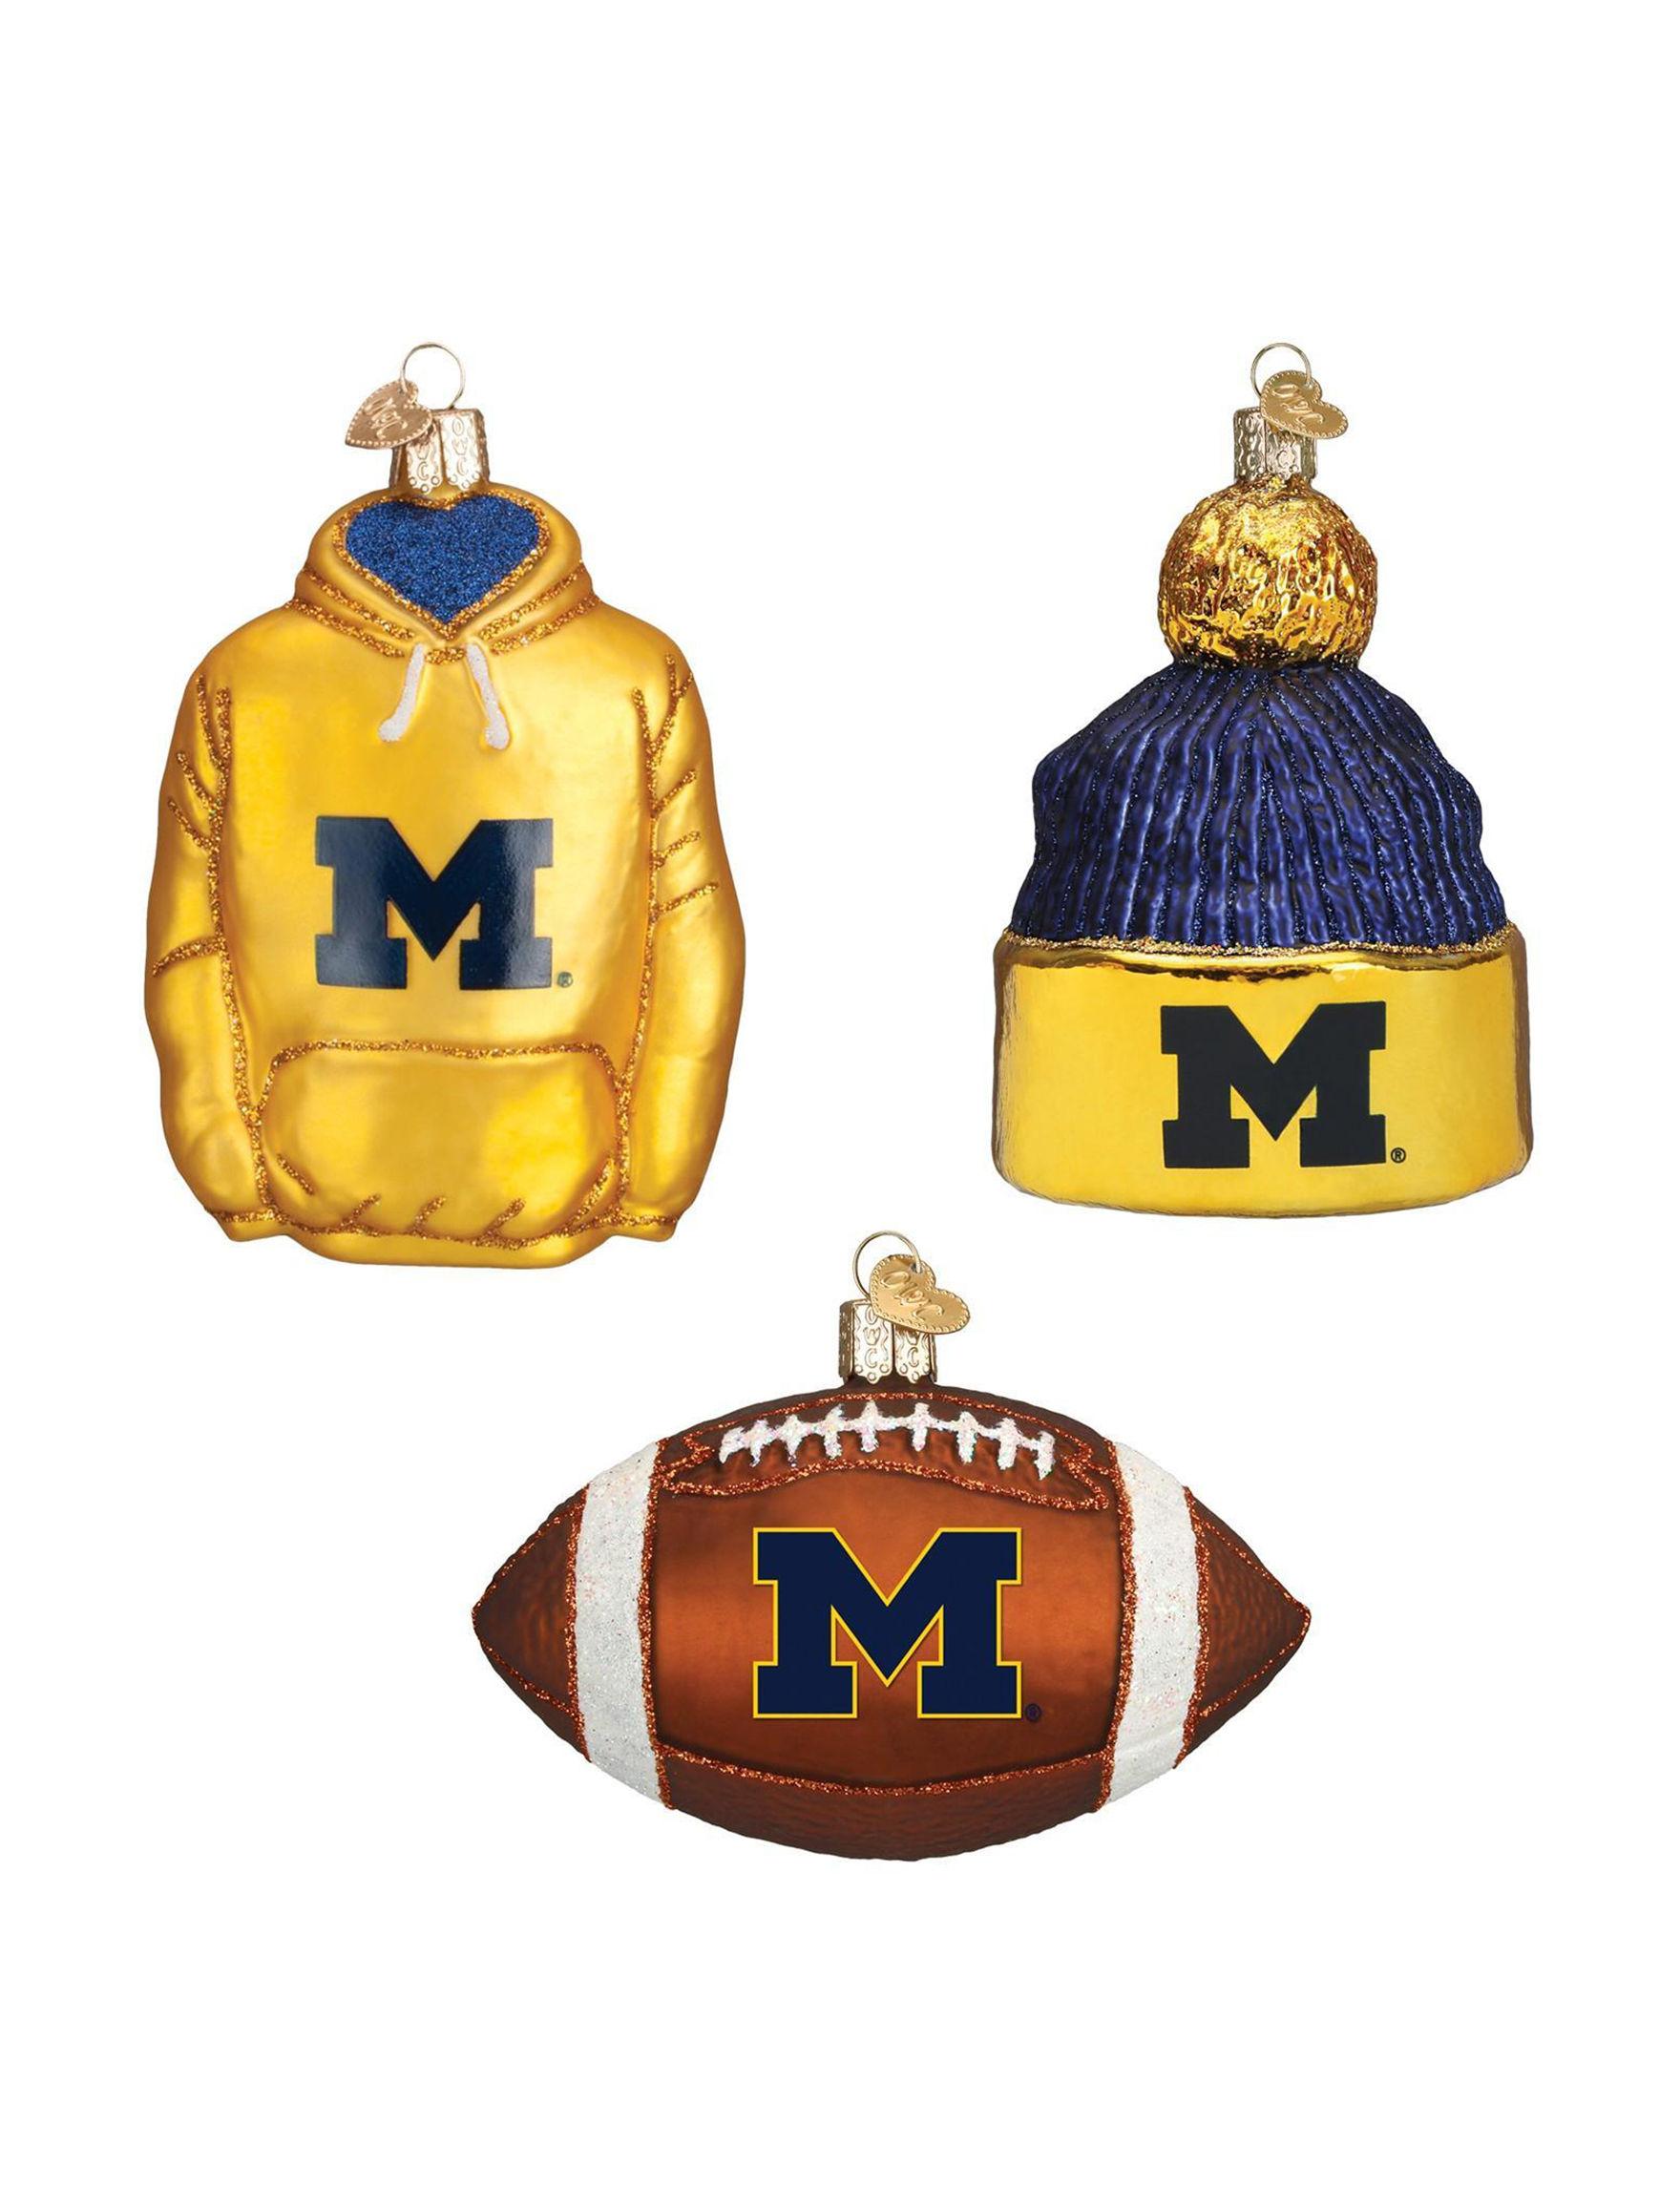 BuySeasons Navy / Gold Decorative Objects Ornaments Holiday Decor